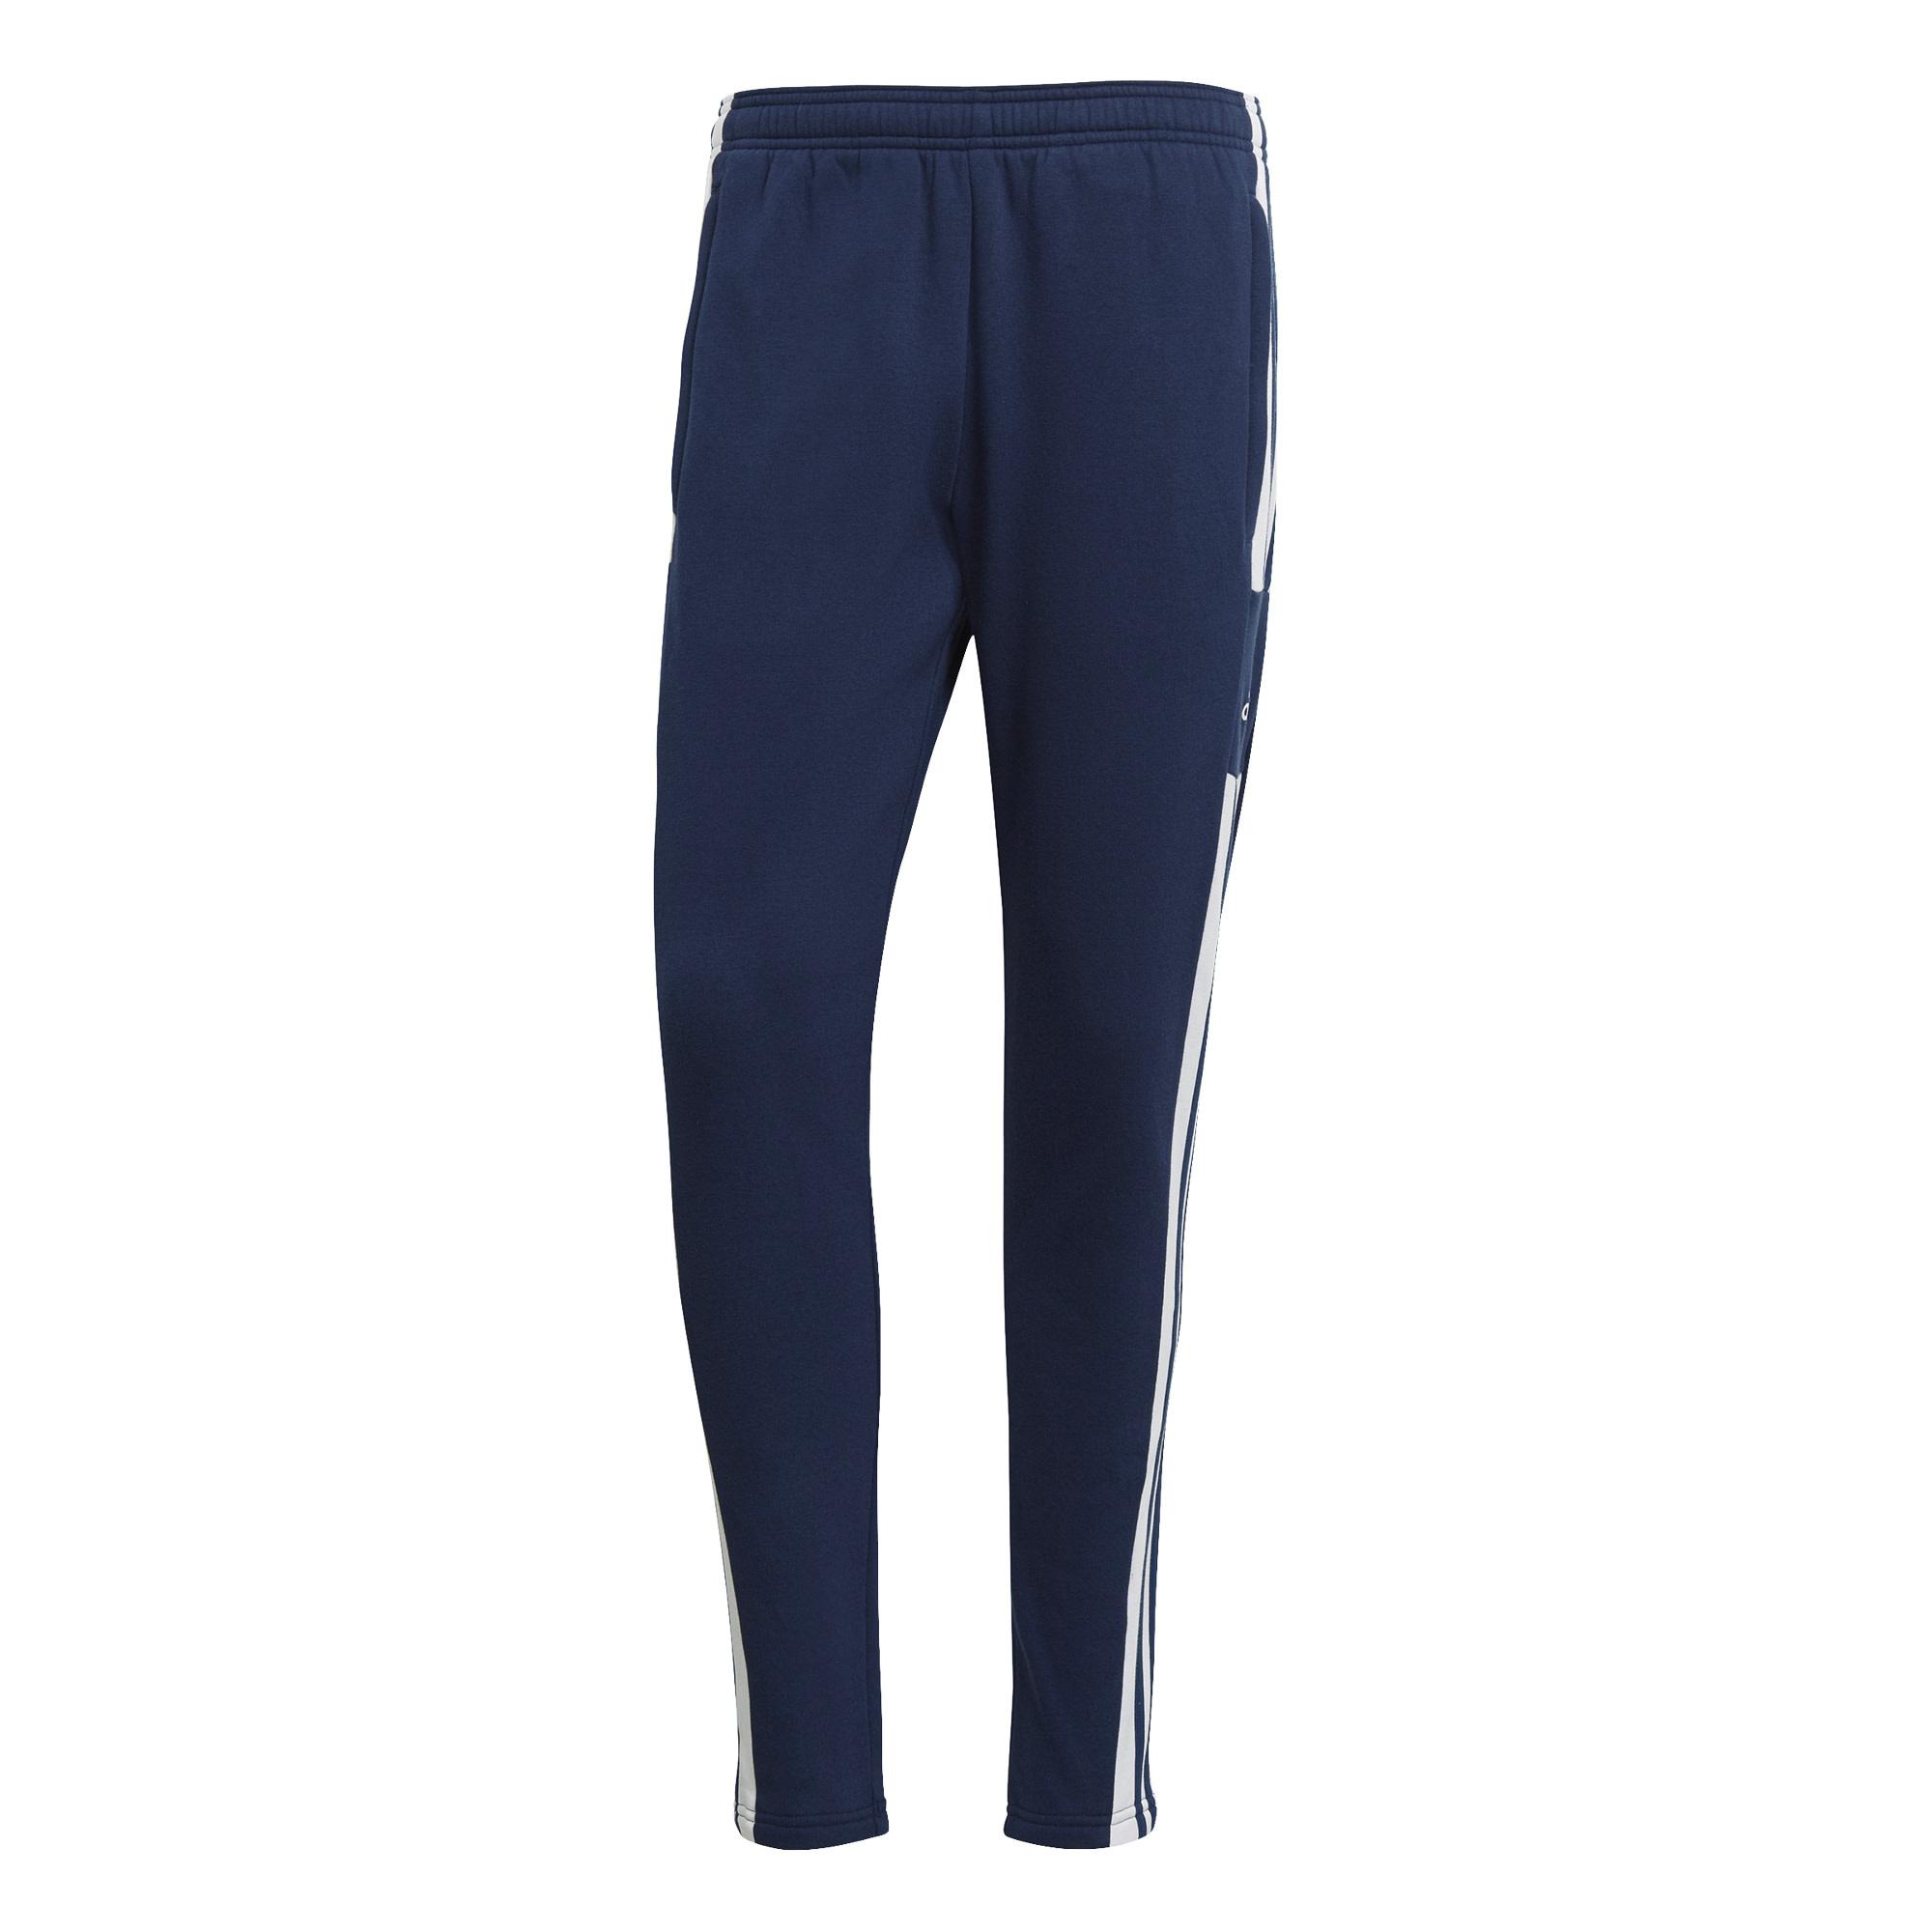 Adidas Squadra 21 Sweat Pant